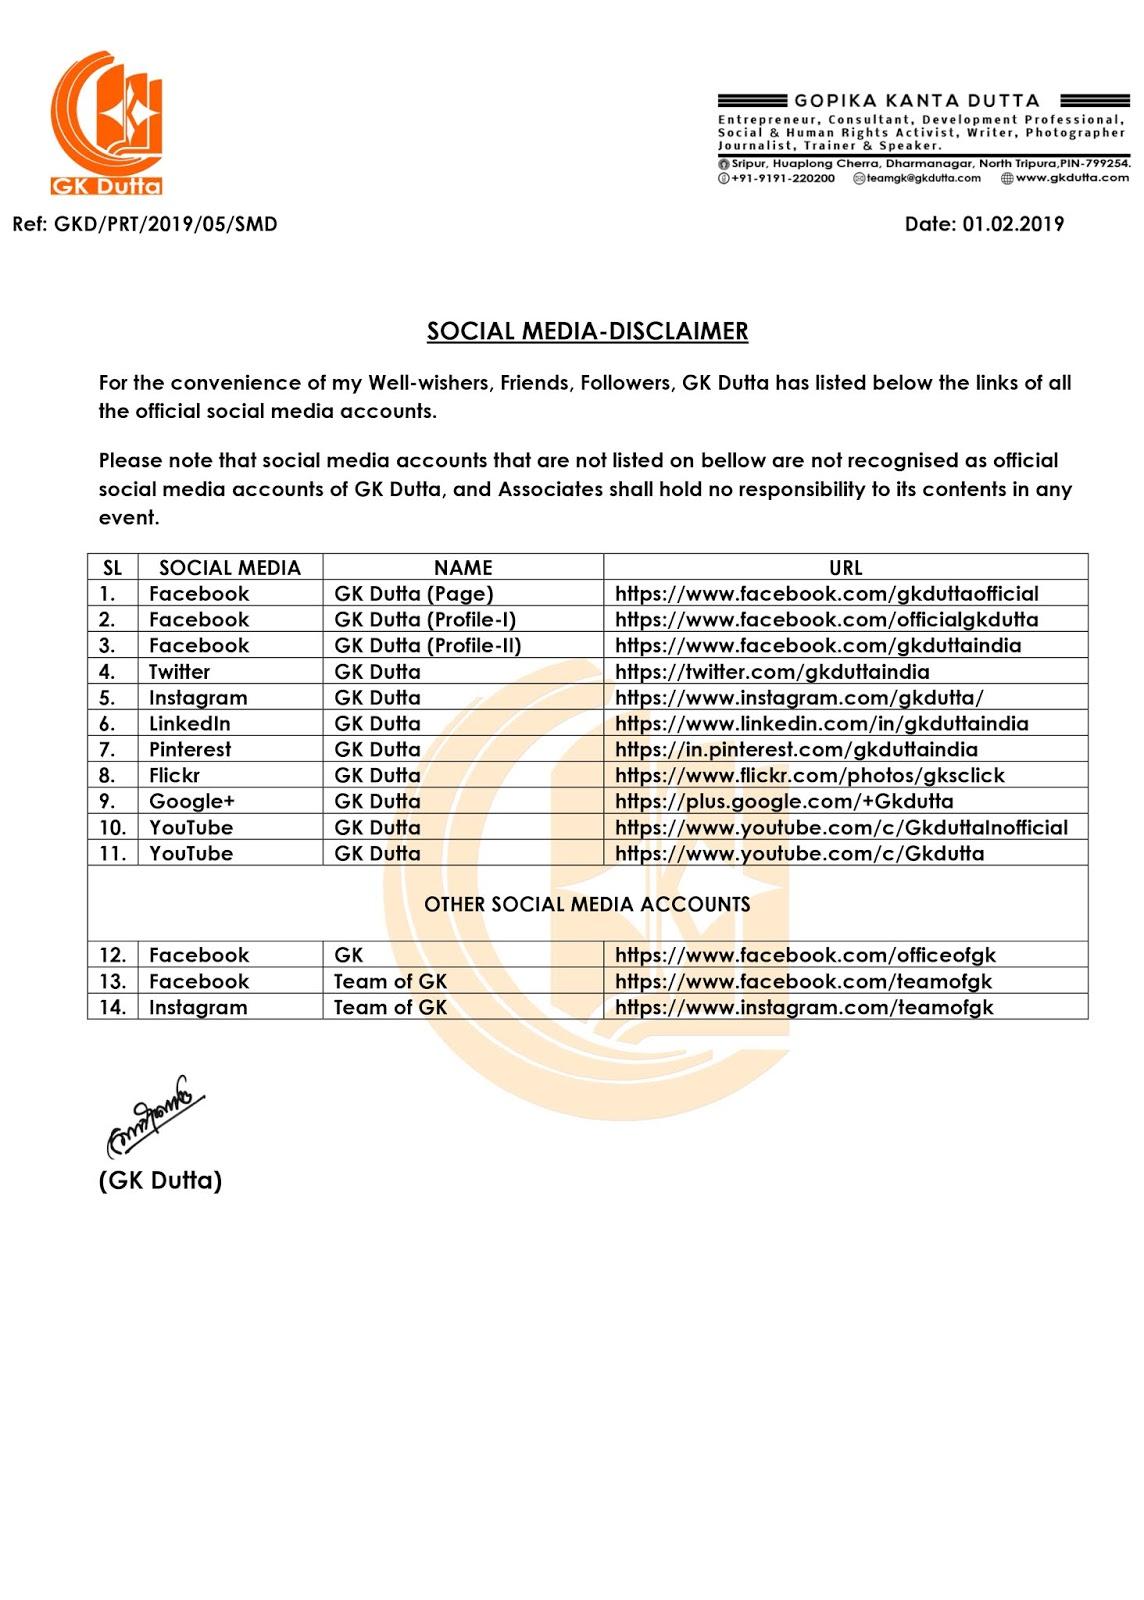 SOCIAL MEDIA-DISCLAIMER-01.02.2019